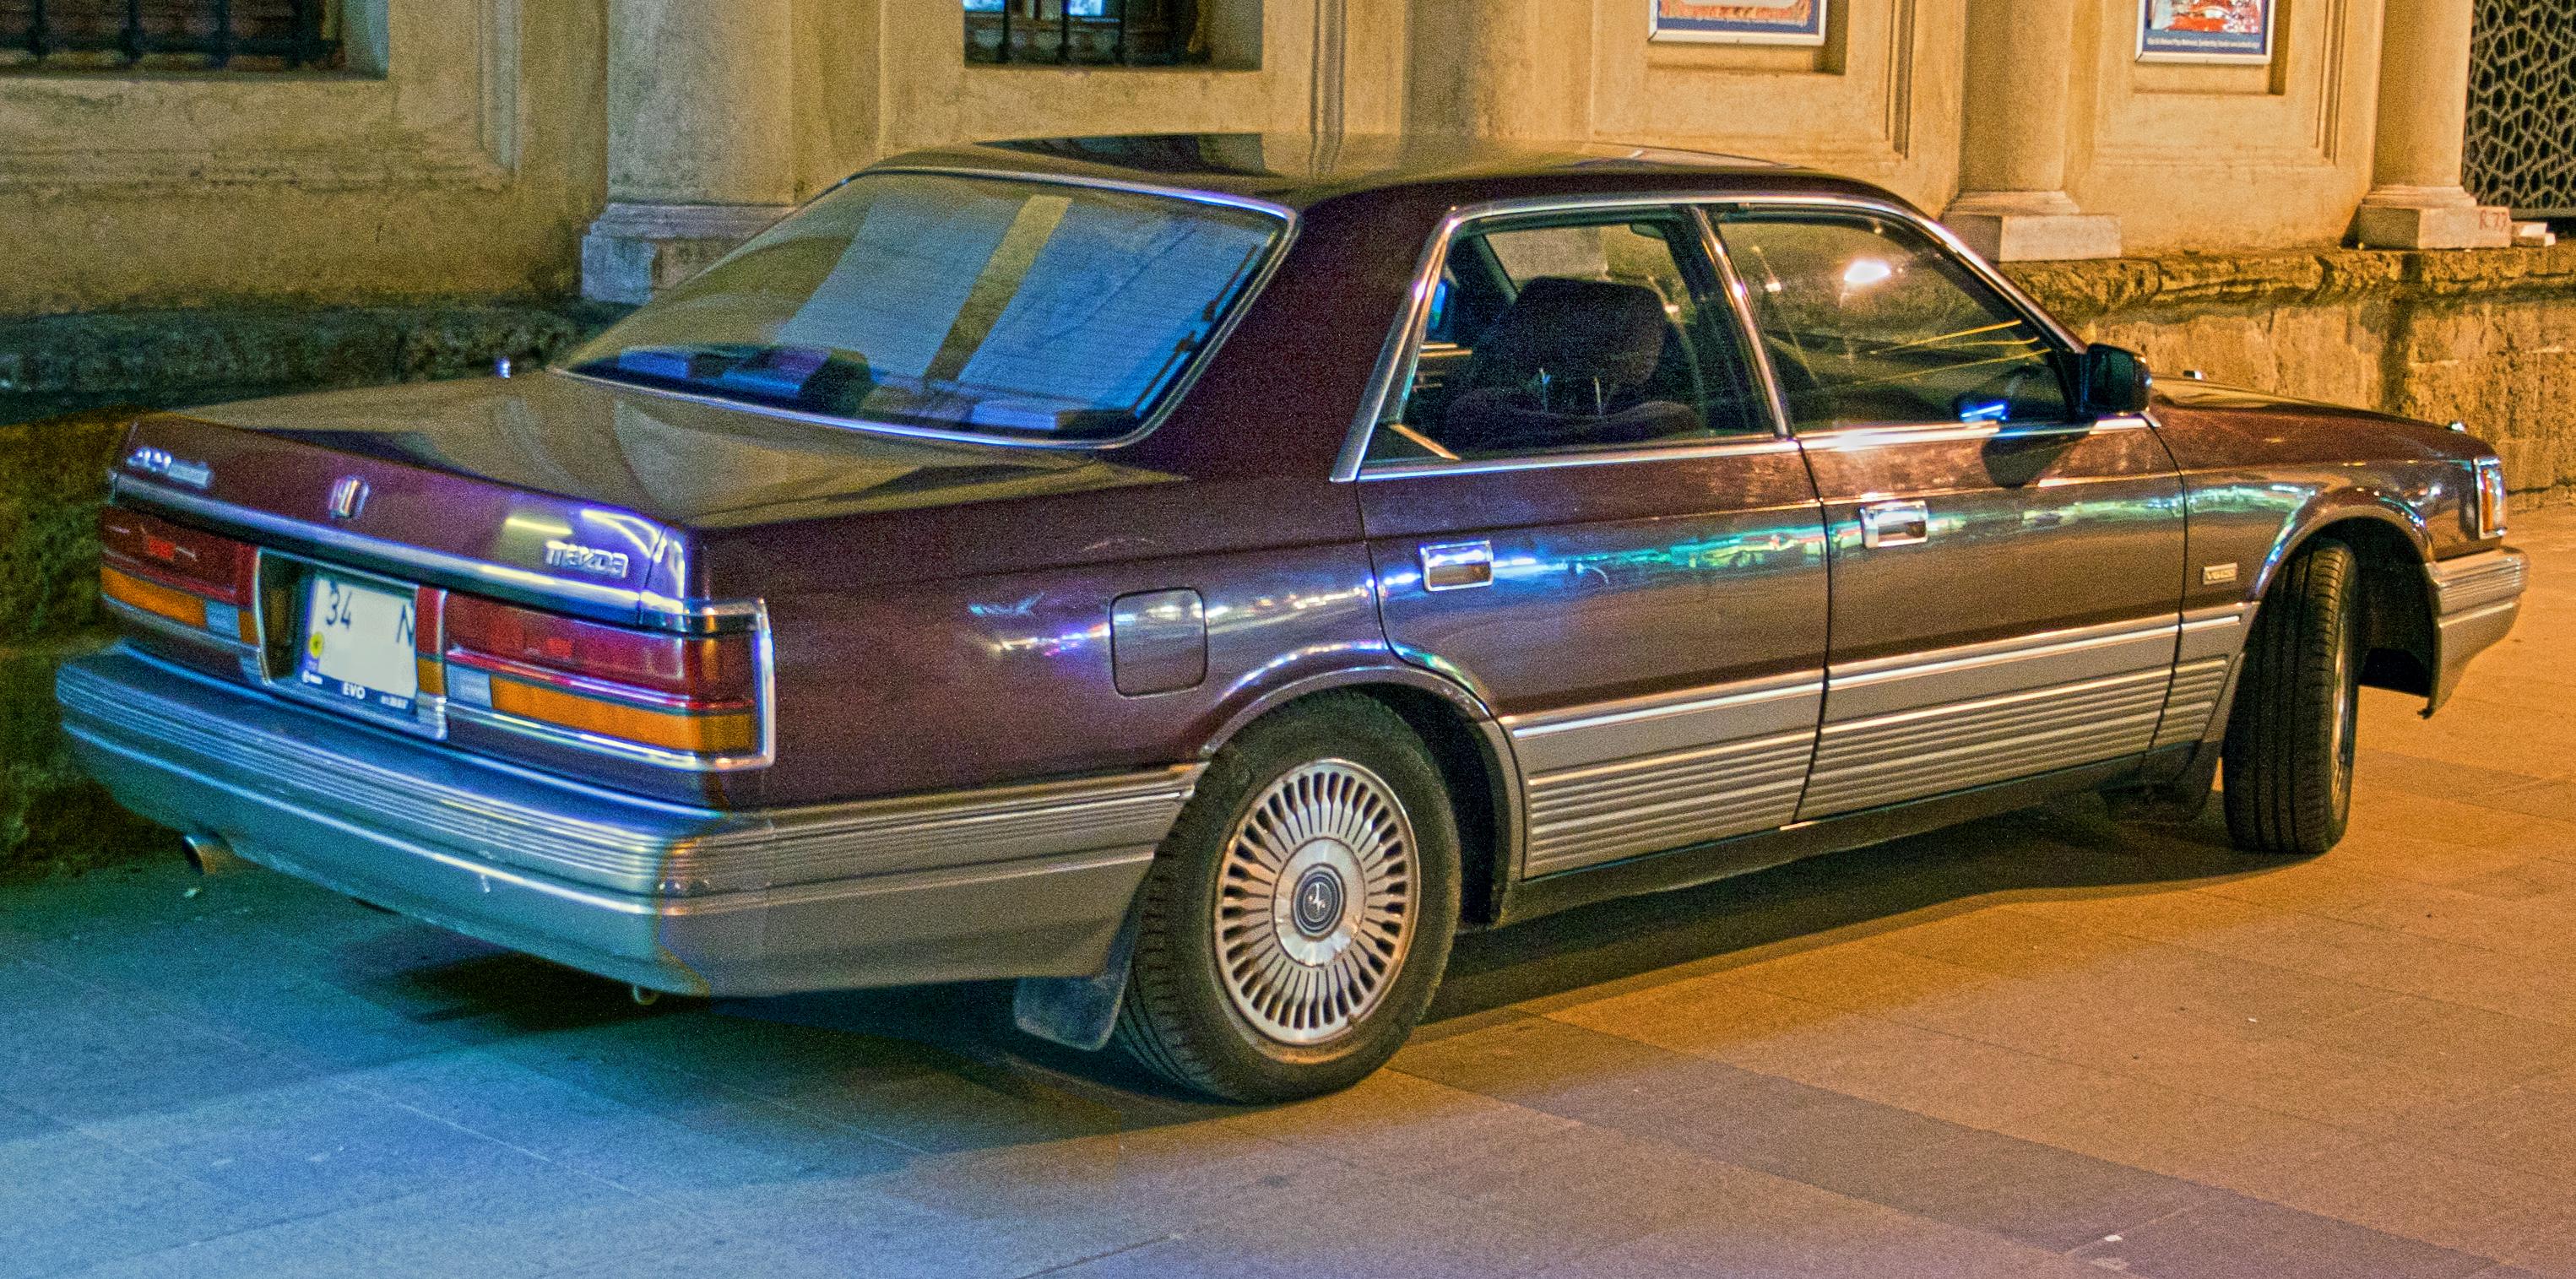 Mazda_929_3.0i_Royal_Classic_Hardtop.jpg